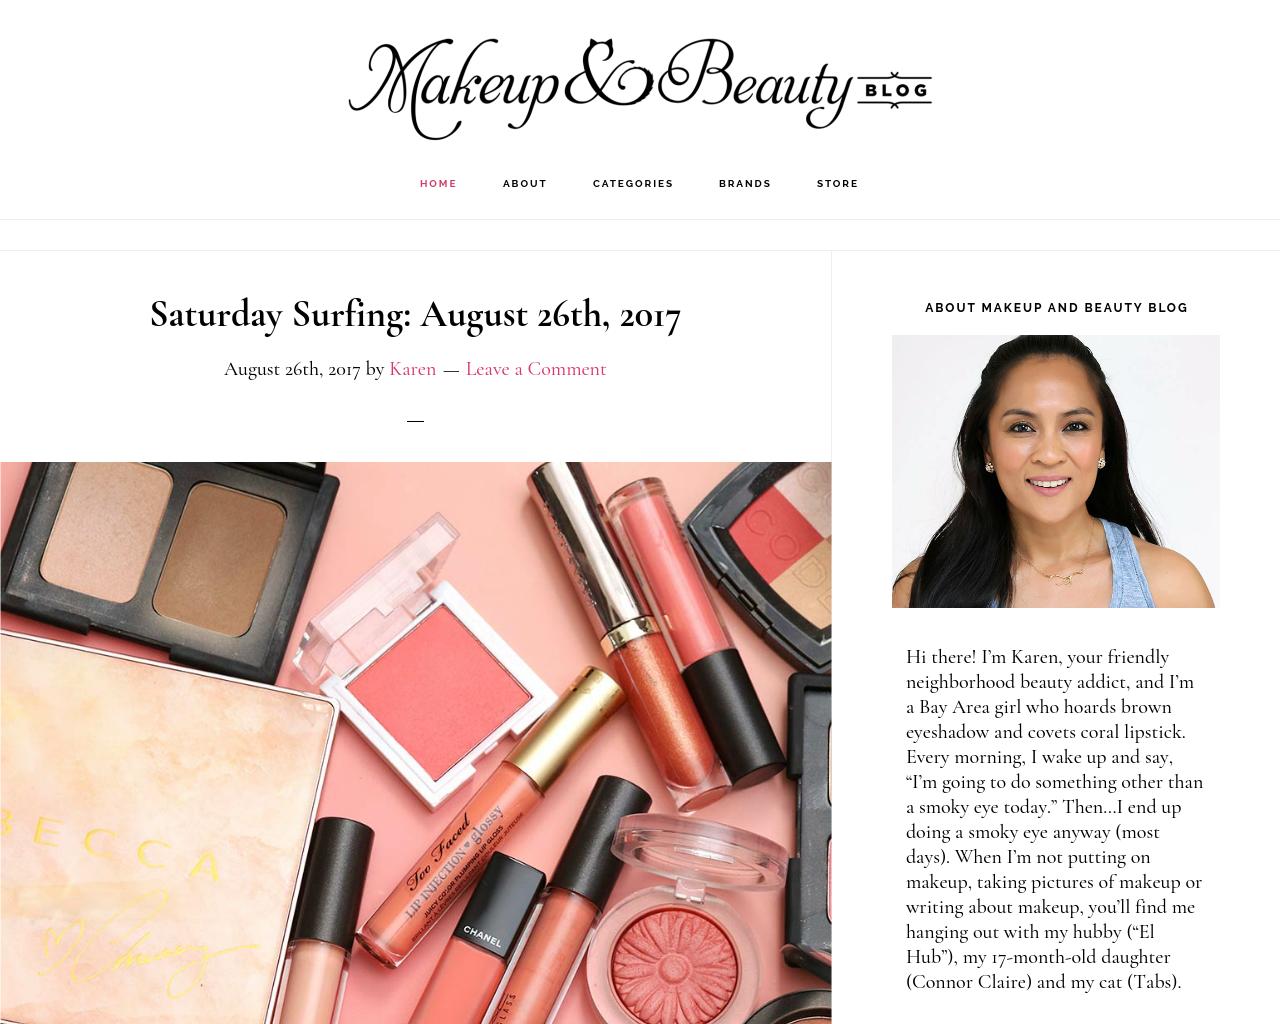 Makeup-&-Beauty-Blog-Advertising-Reviews-Pricing